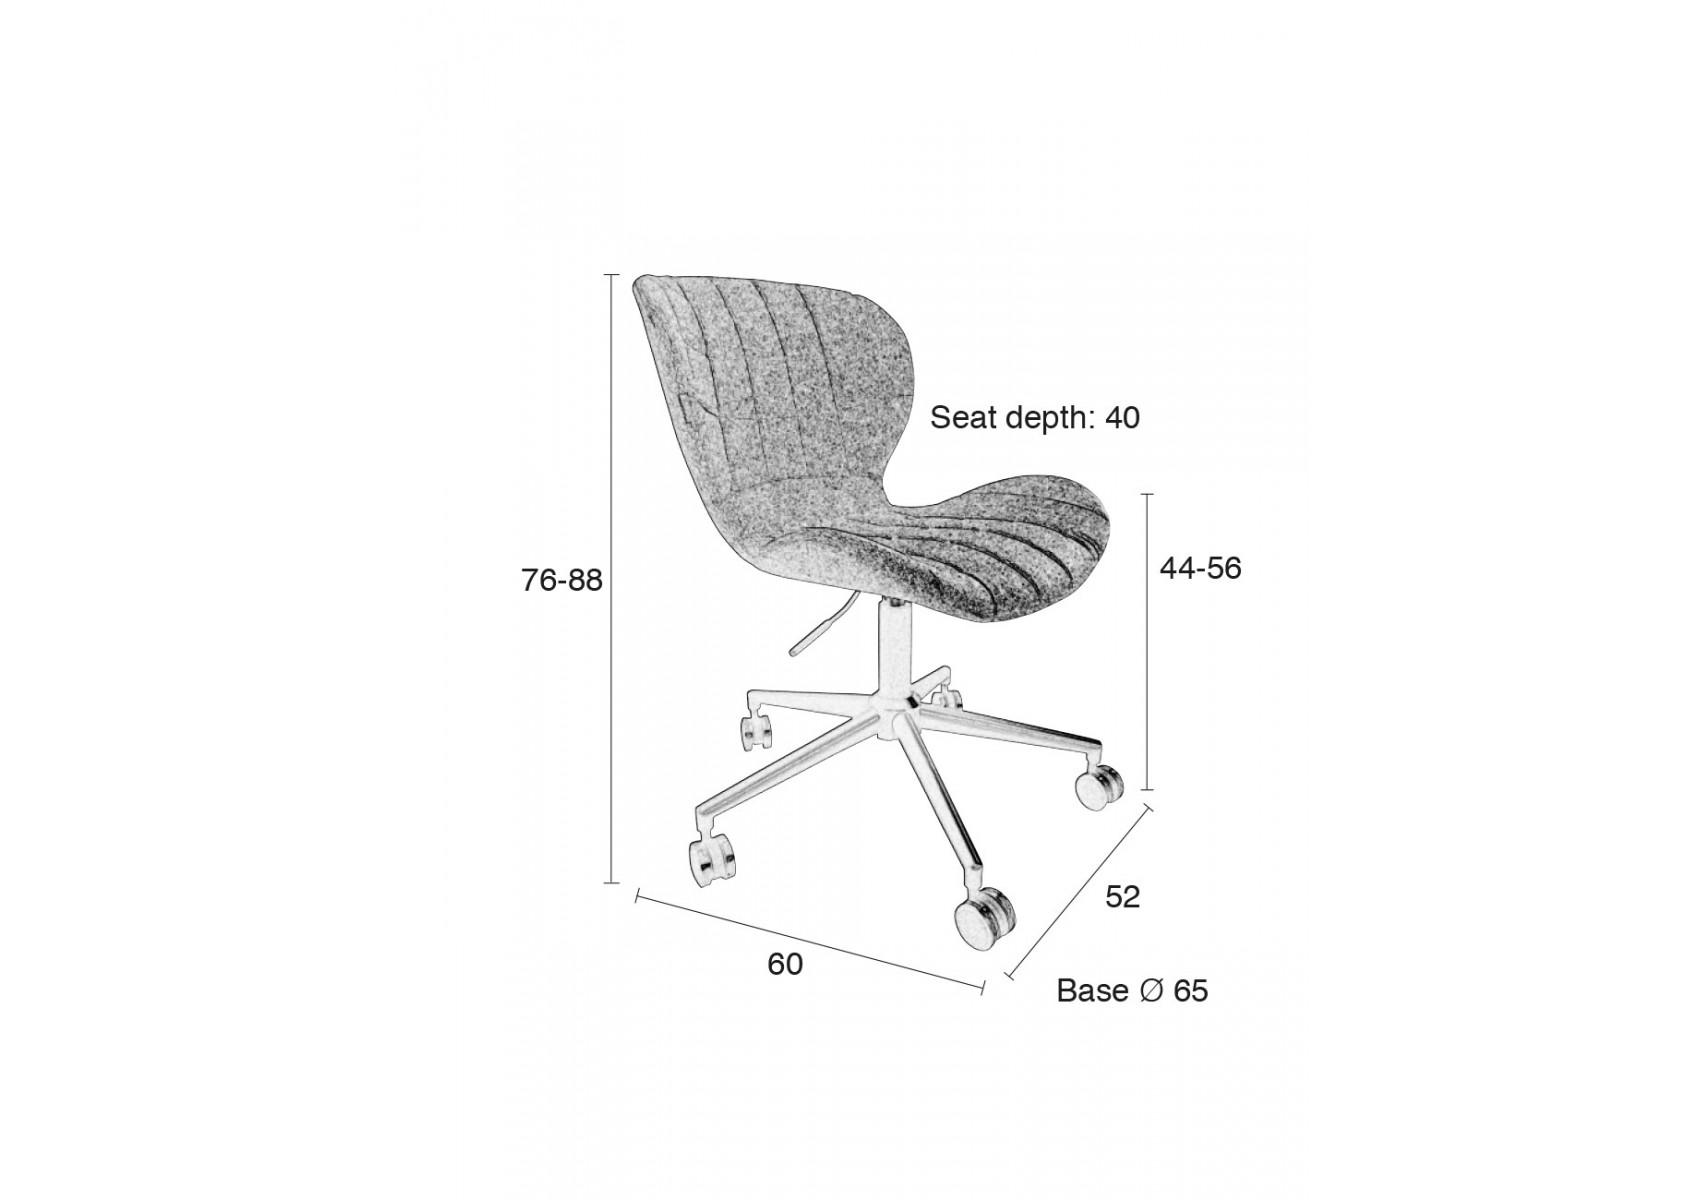 Chaise de bureau design omg office zuiver boite design for Chaise zuiver omg